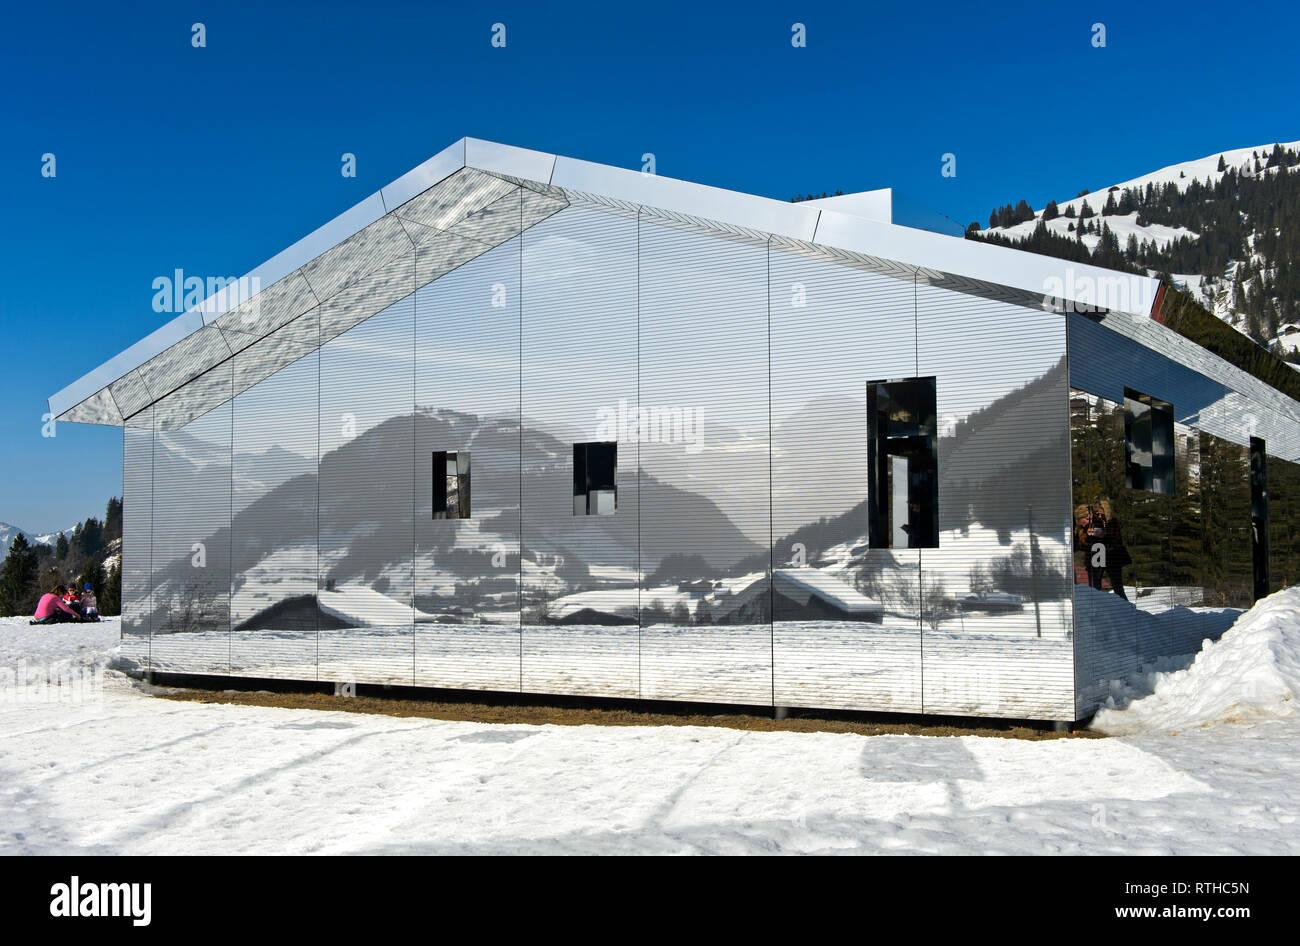 Mirror house Mirage Gstaad by Doug Aitken, Art Exhibition Elevation 1049: Frequencies, Gstaad, Switzerland - Stock Image